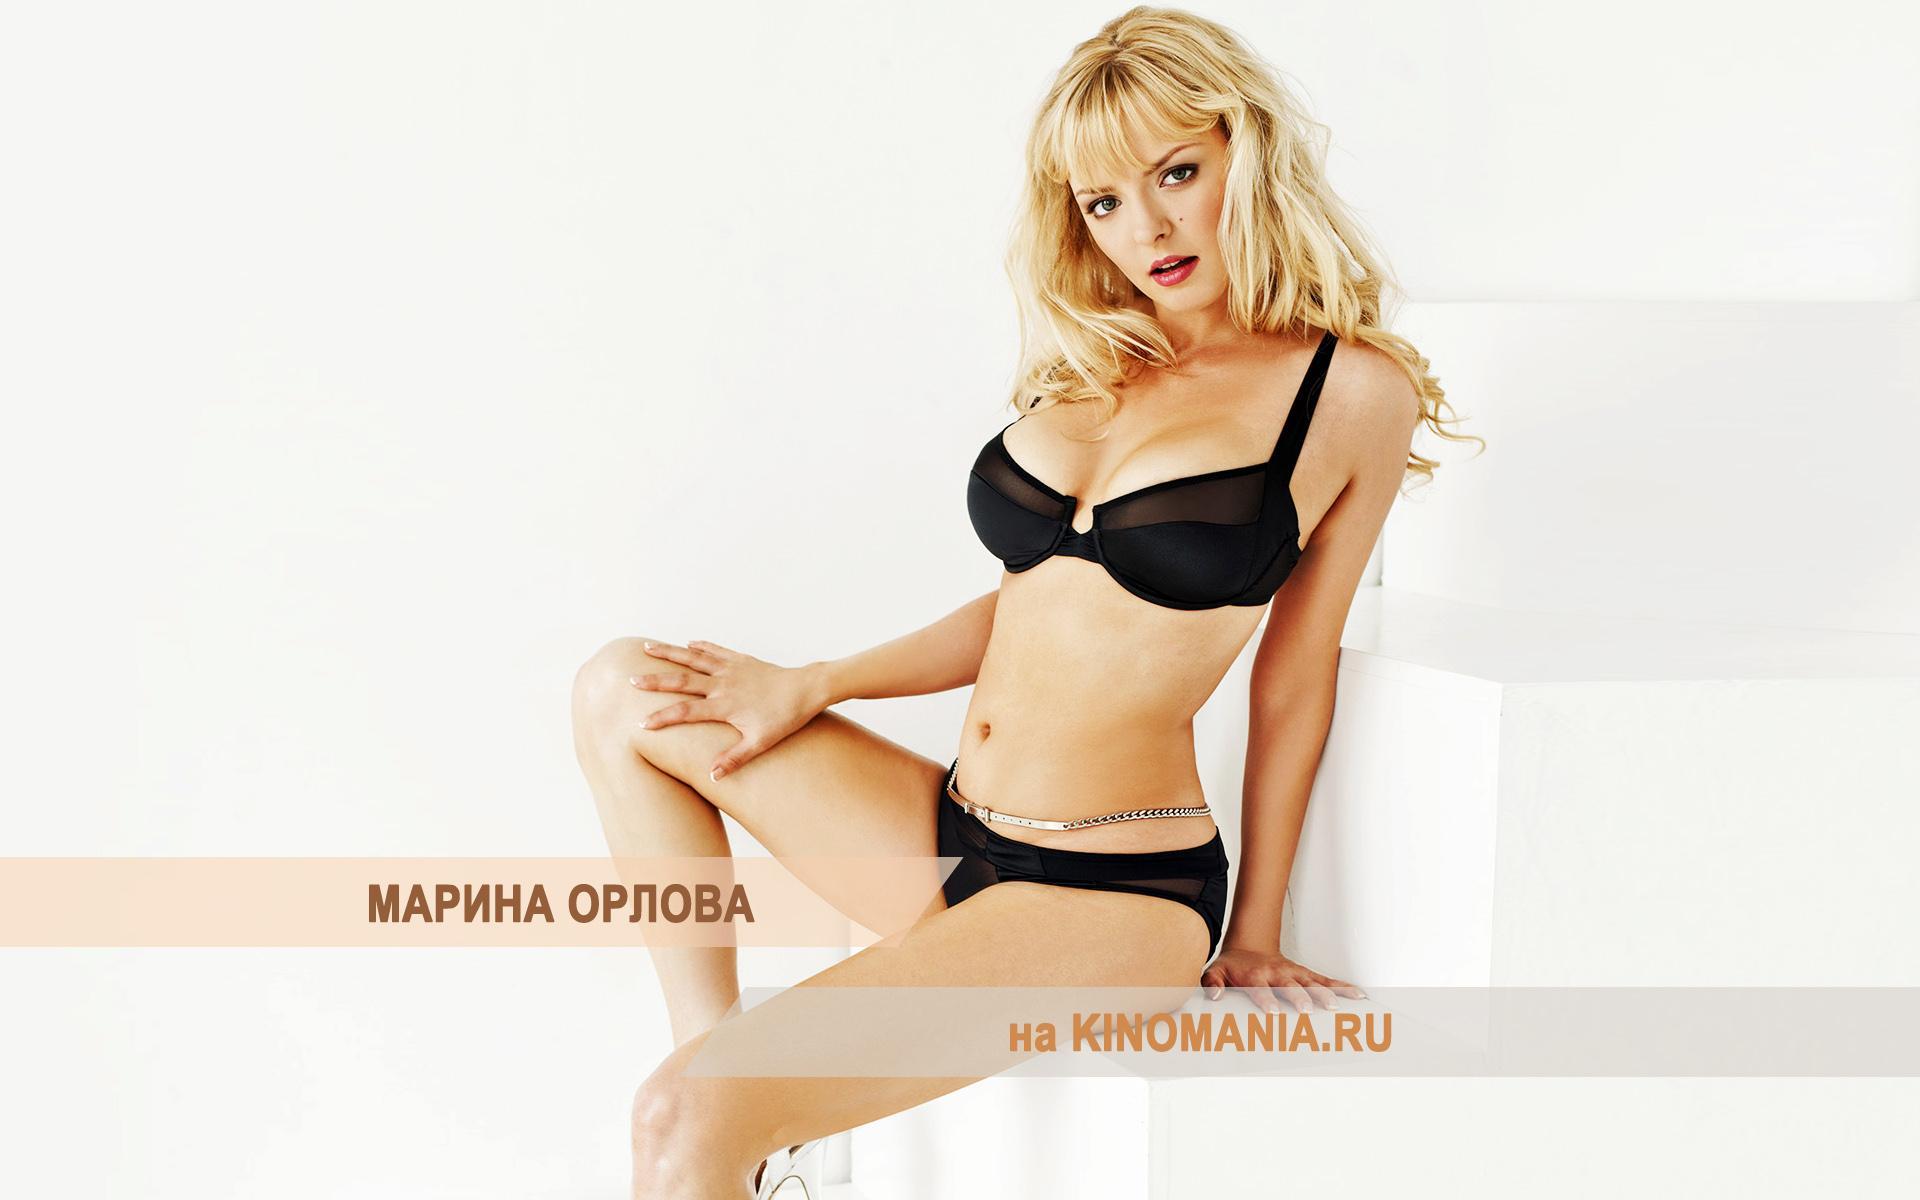 porno-marini-orlovoy